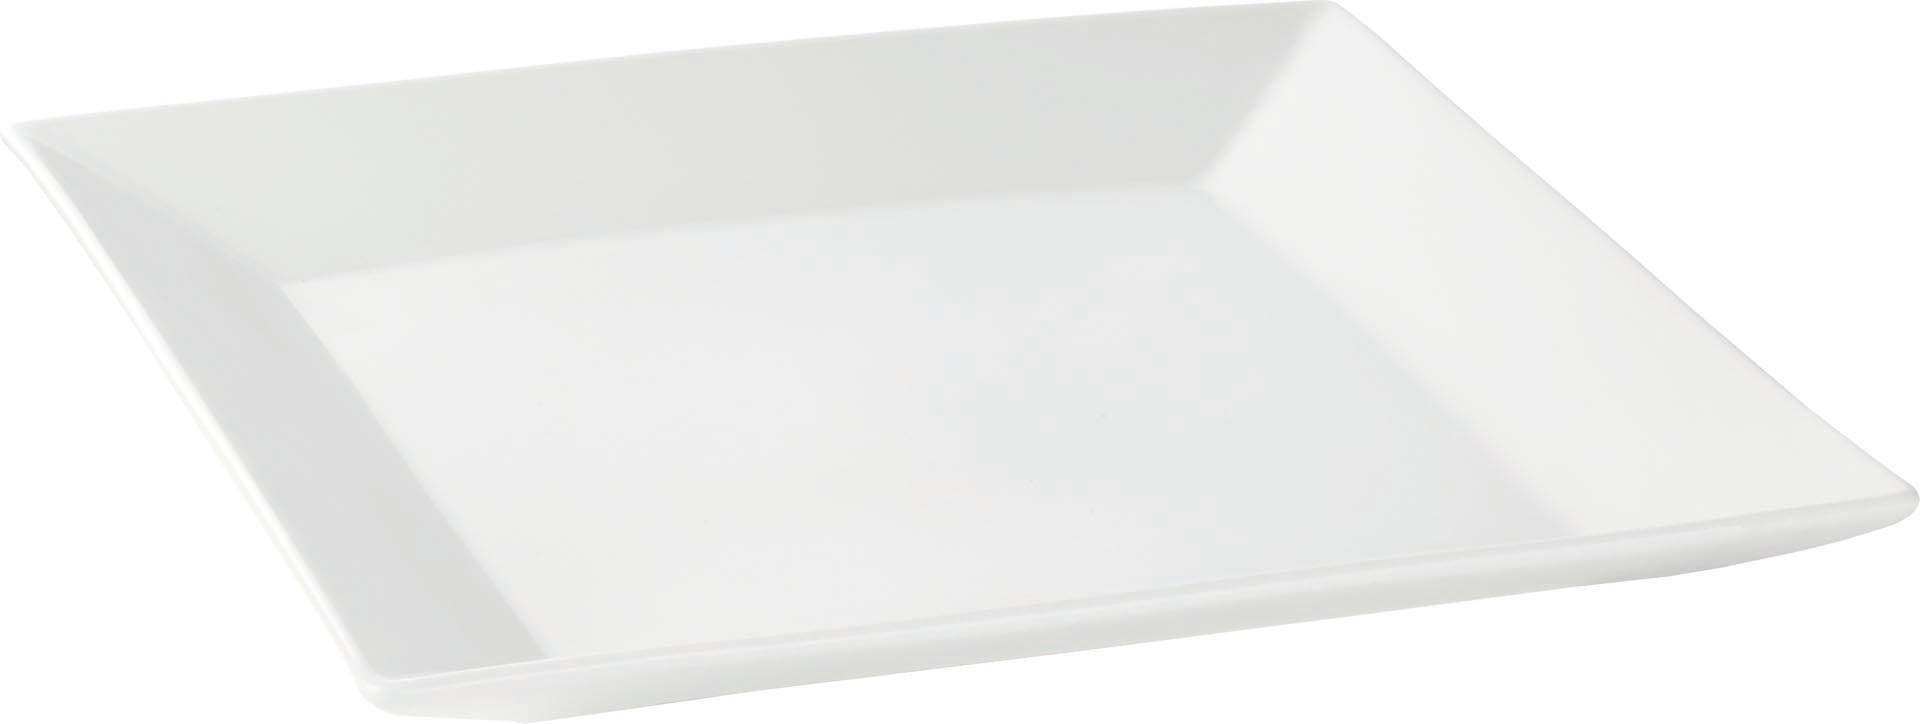 "Platte flach ""Carré"" quadratisch 35 cm"